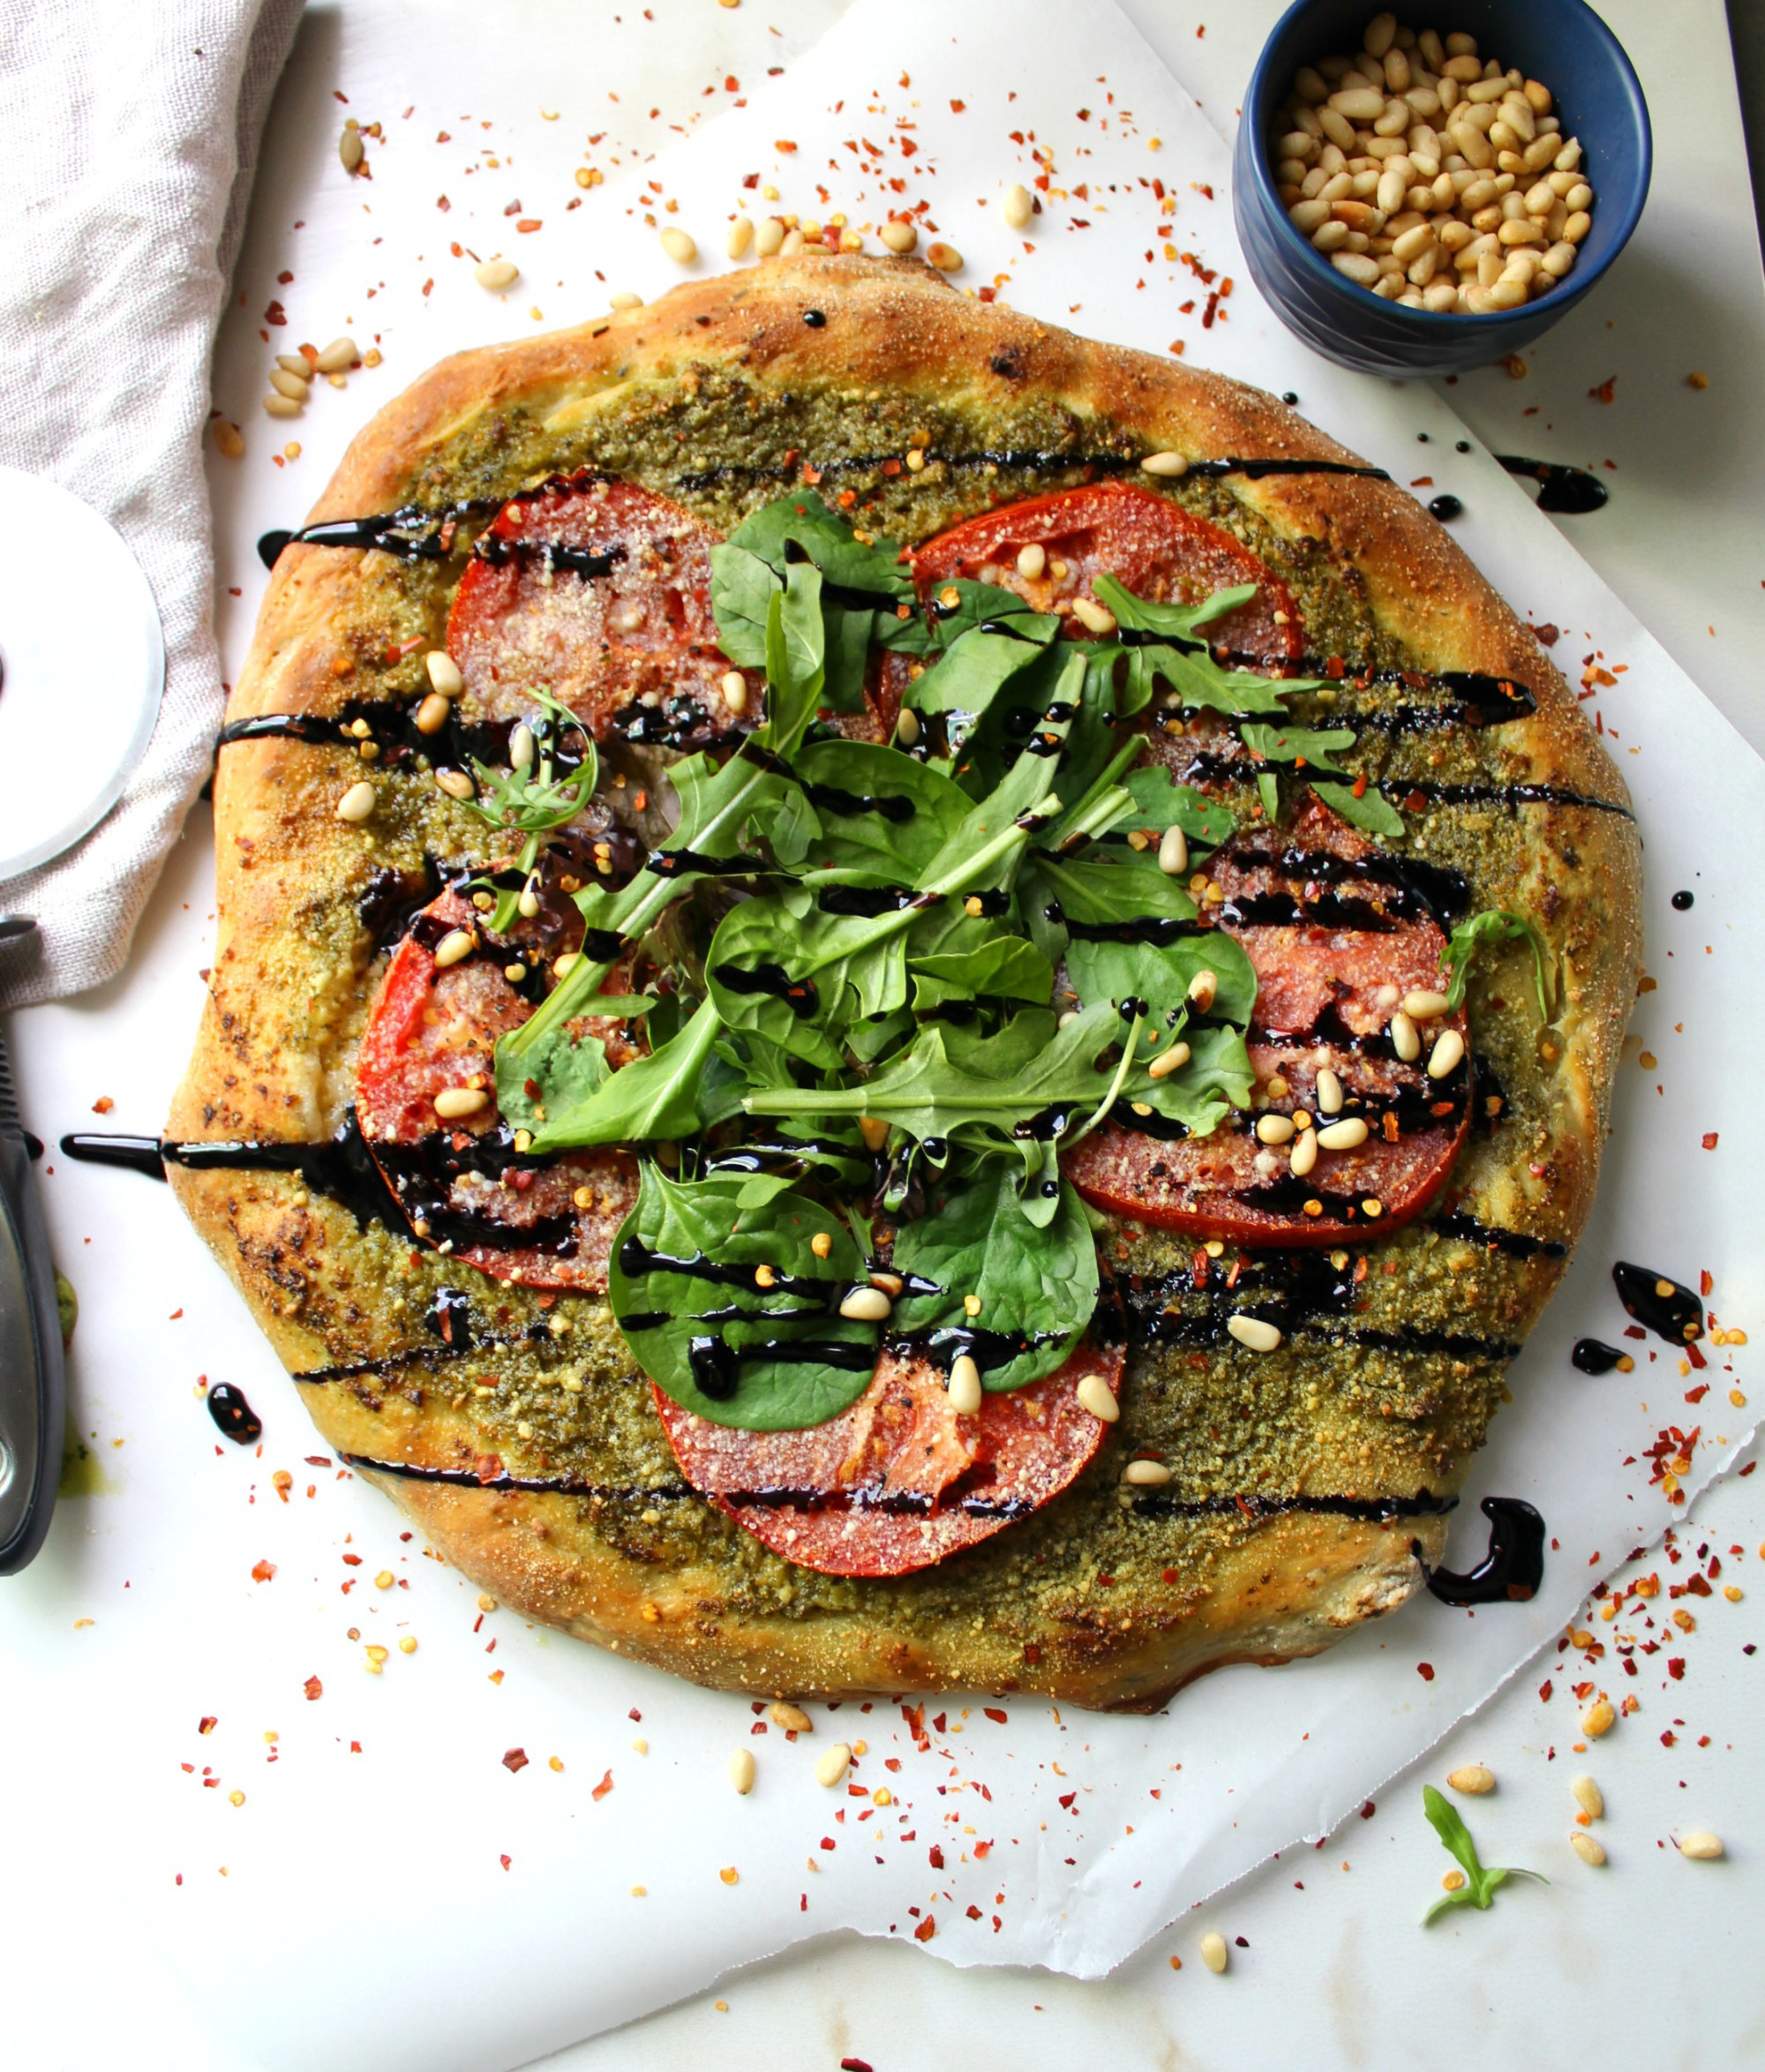 Pesto Pizza with Balsamic Glaze